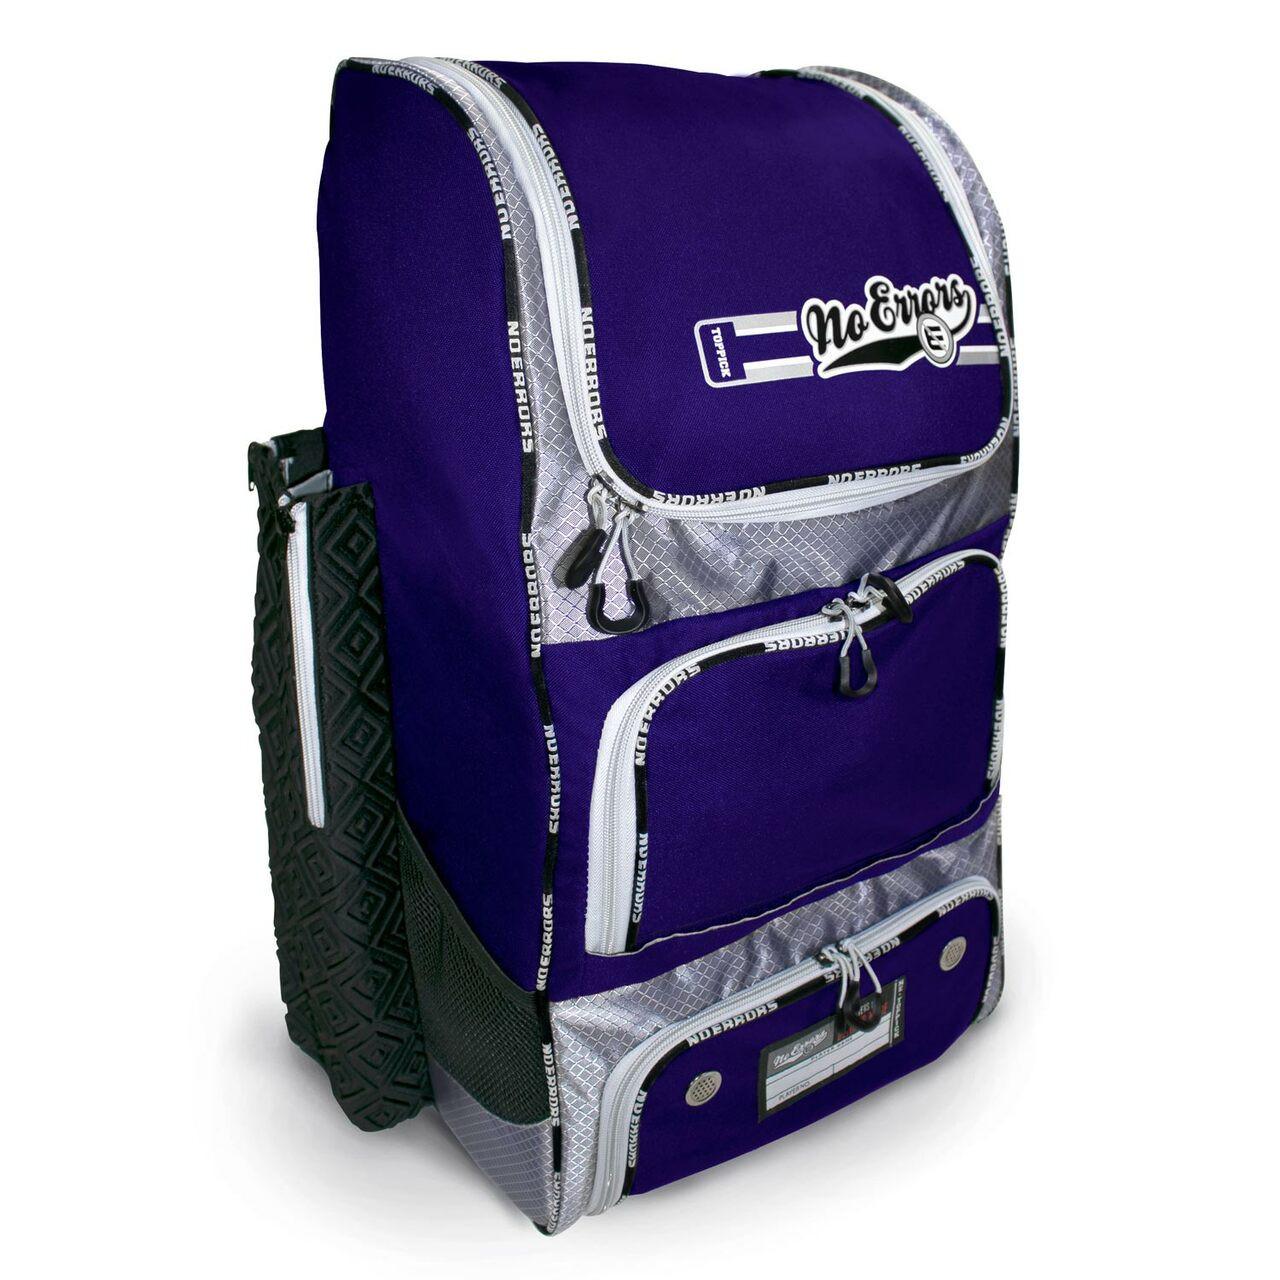 No Errors Top Pick Backpack